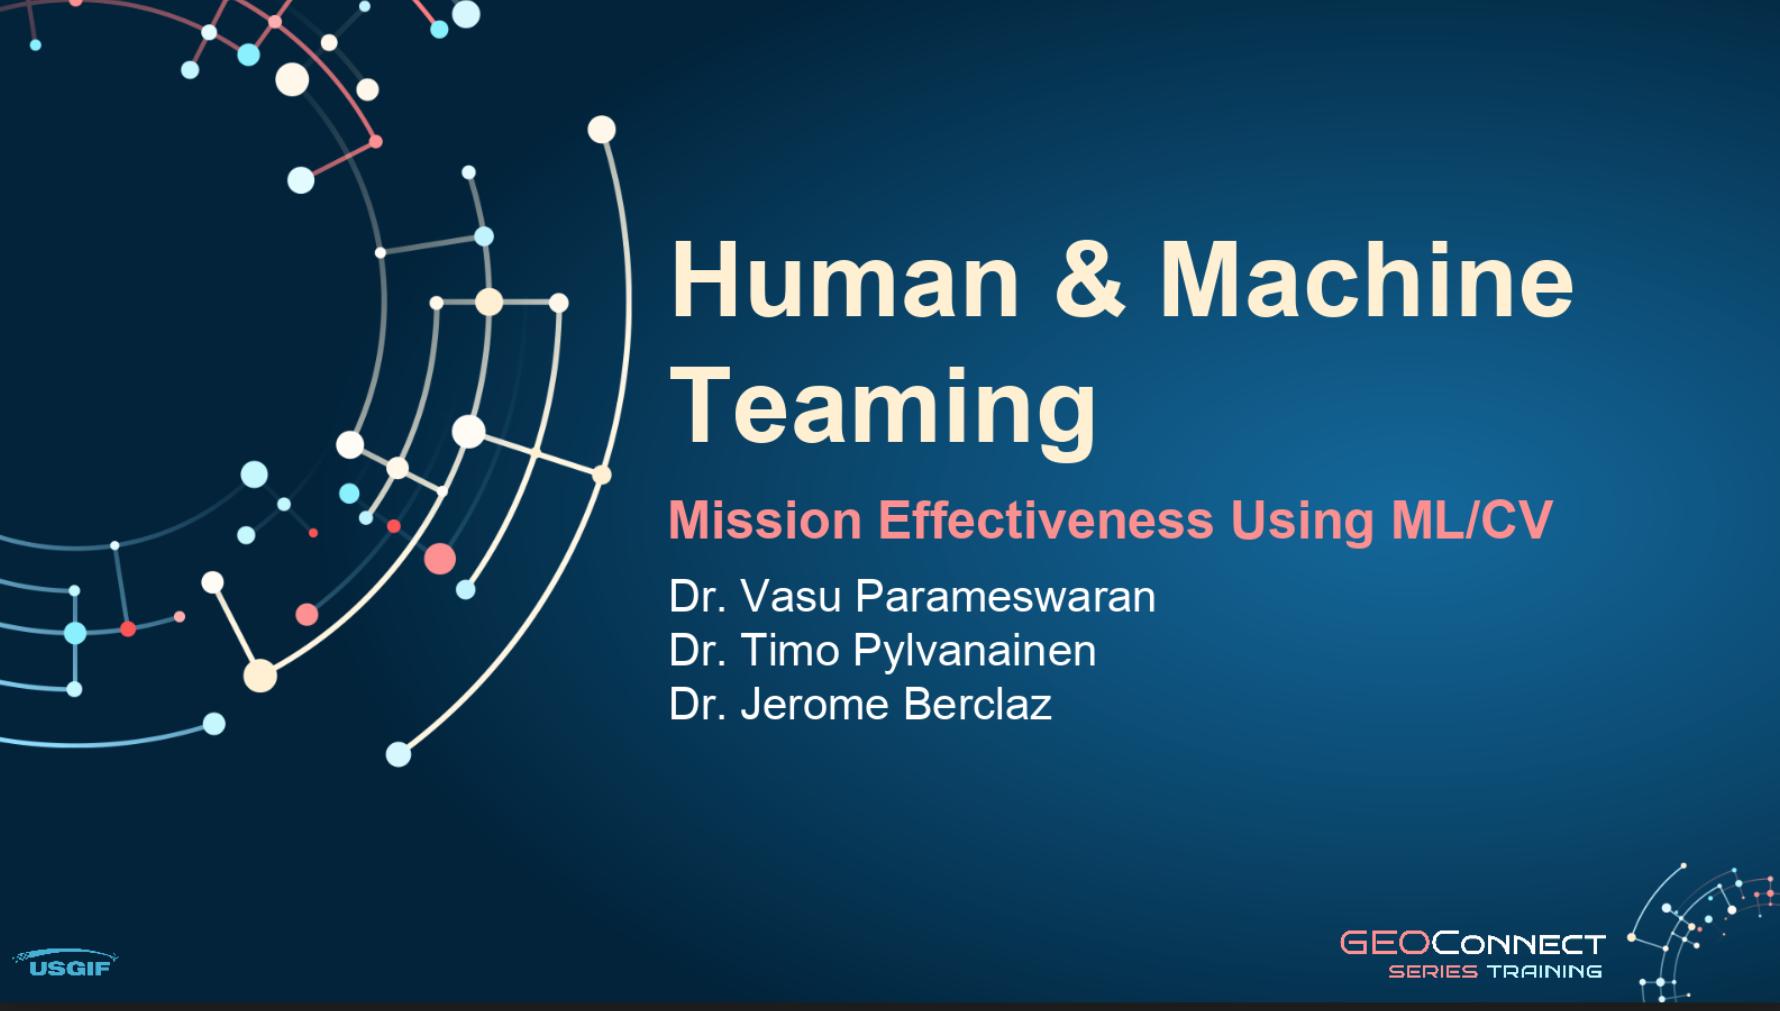 Human & Machine Teaming. Mission Effectiveness using ML/CV